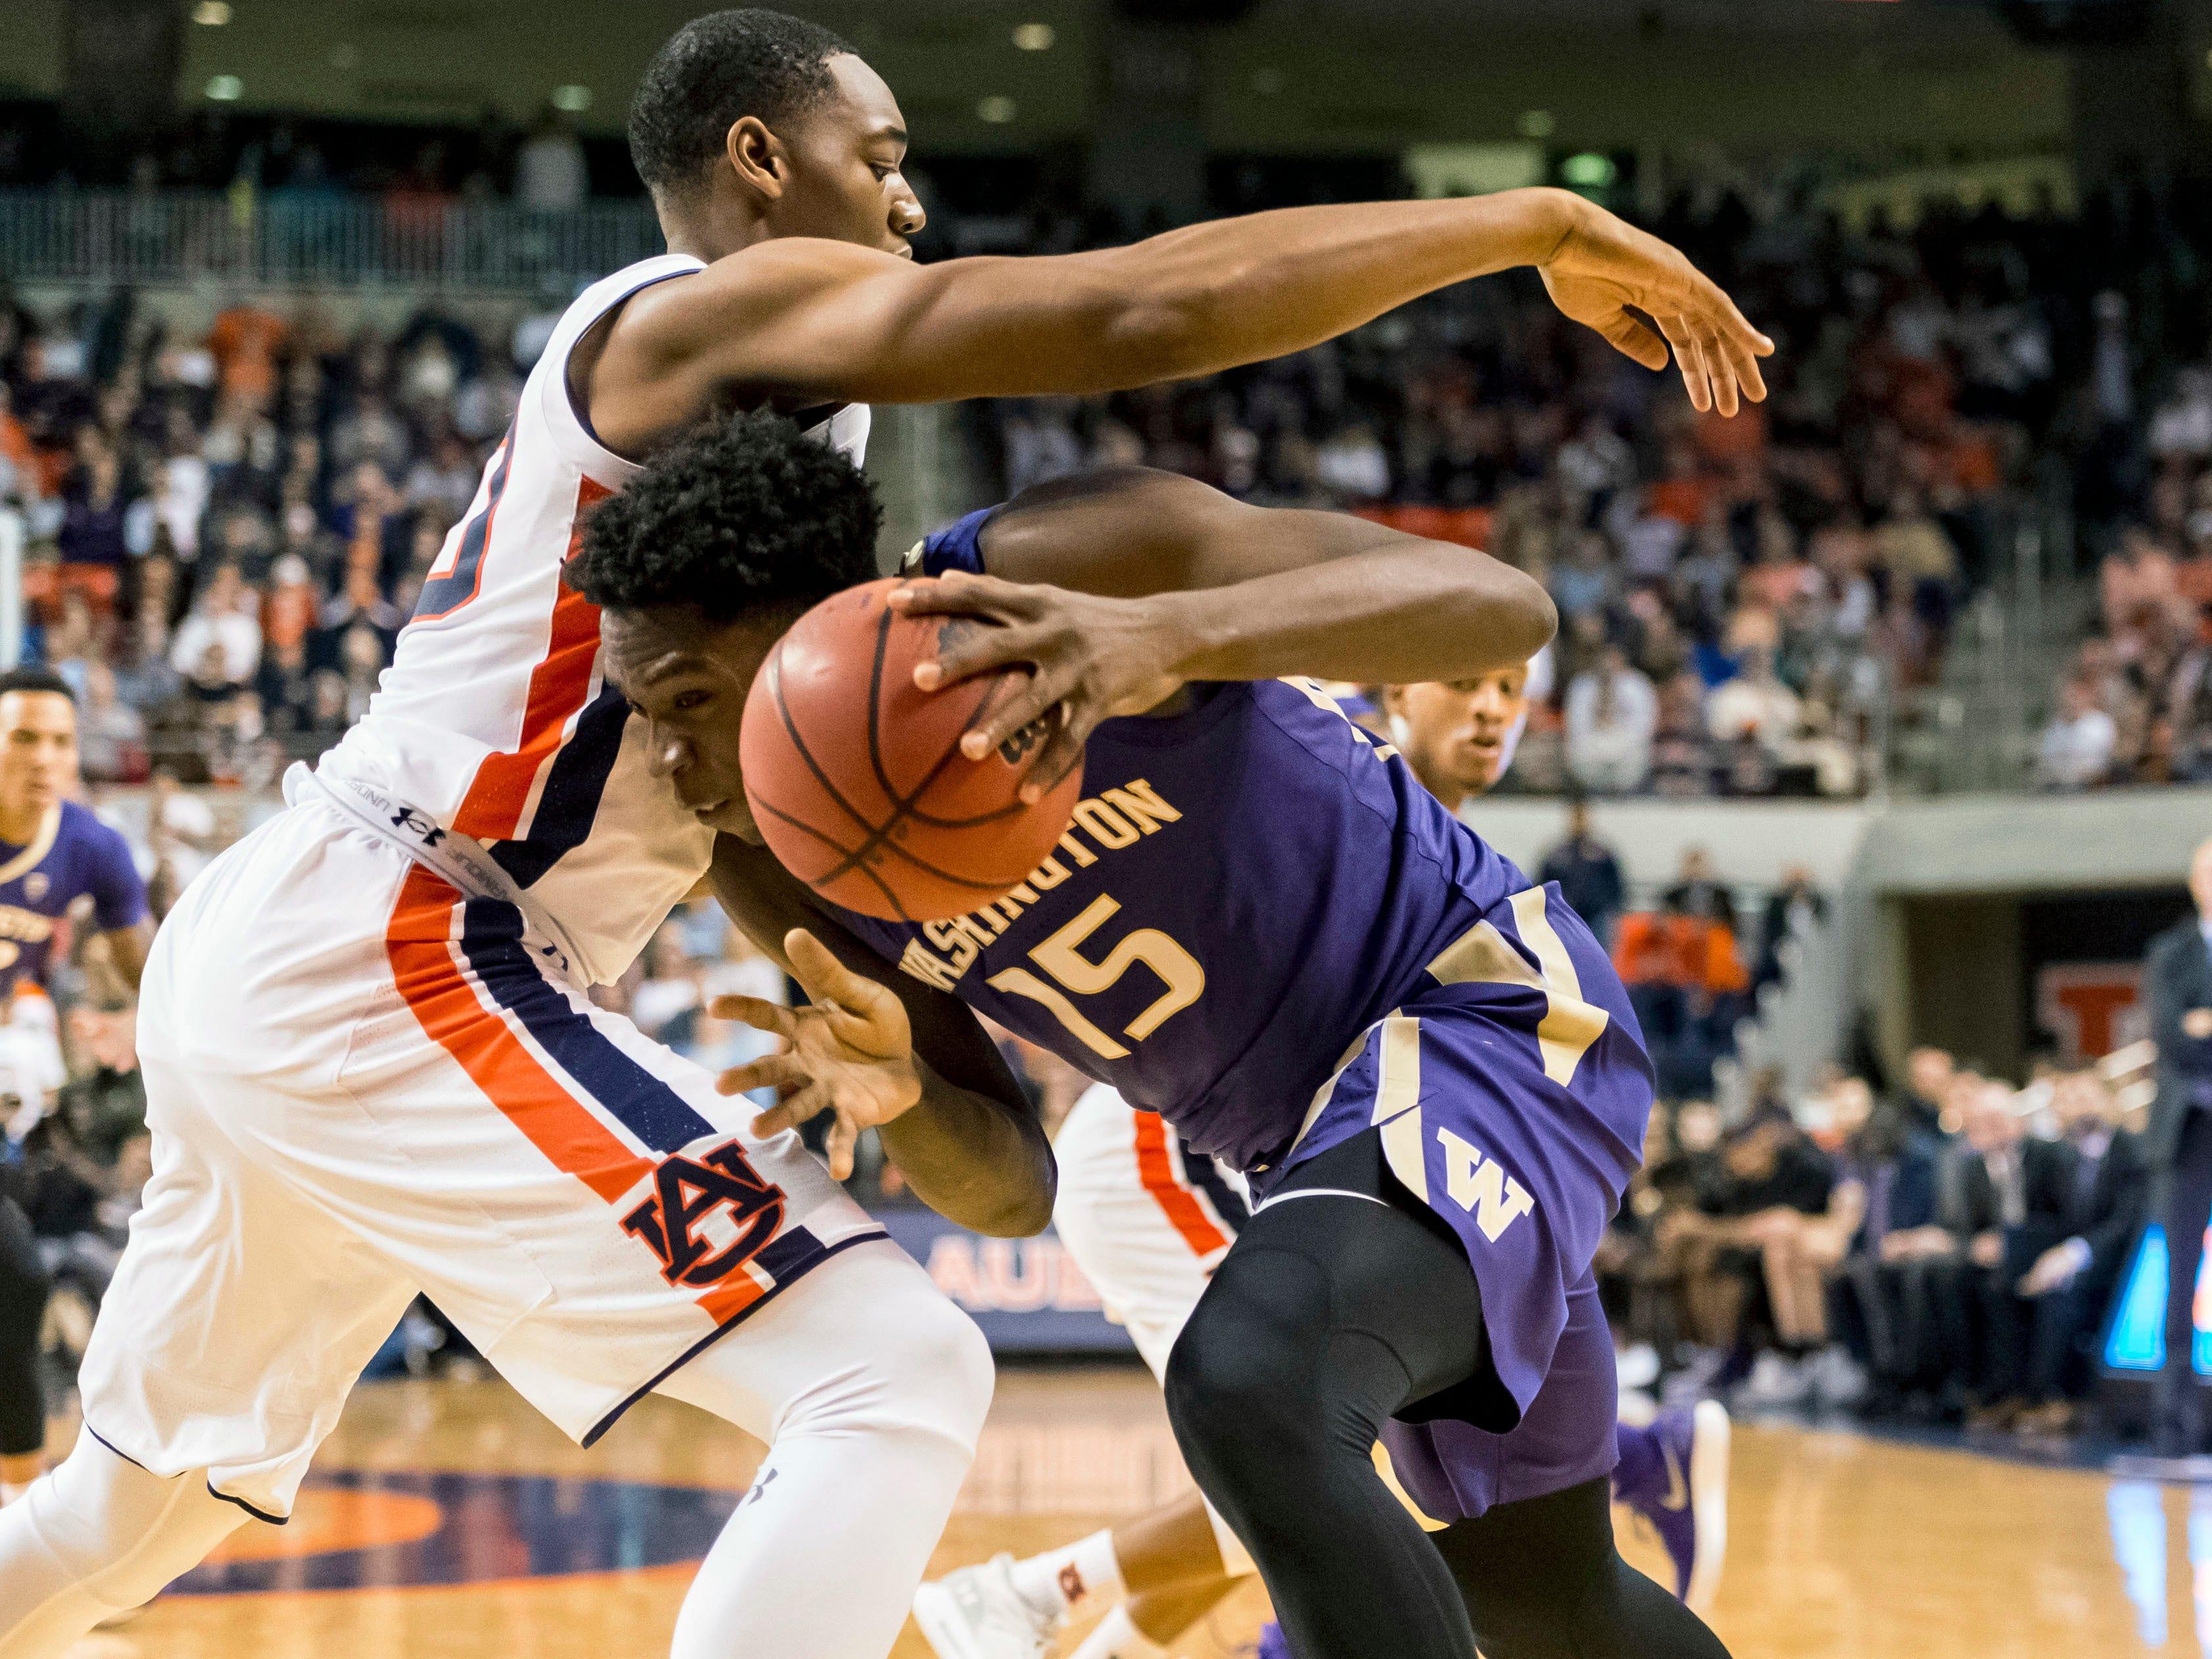 Washington forward Noah Dickerson (15) challenges Auburn center Austin Wiley (50) on Friday, Nov. 9, 2018, in Auburn, Ala.